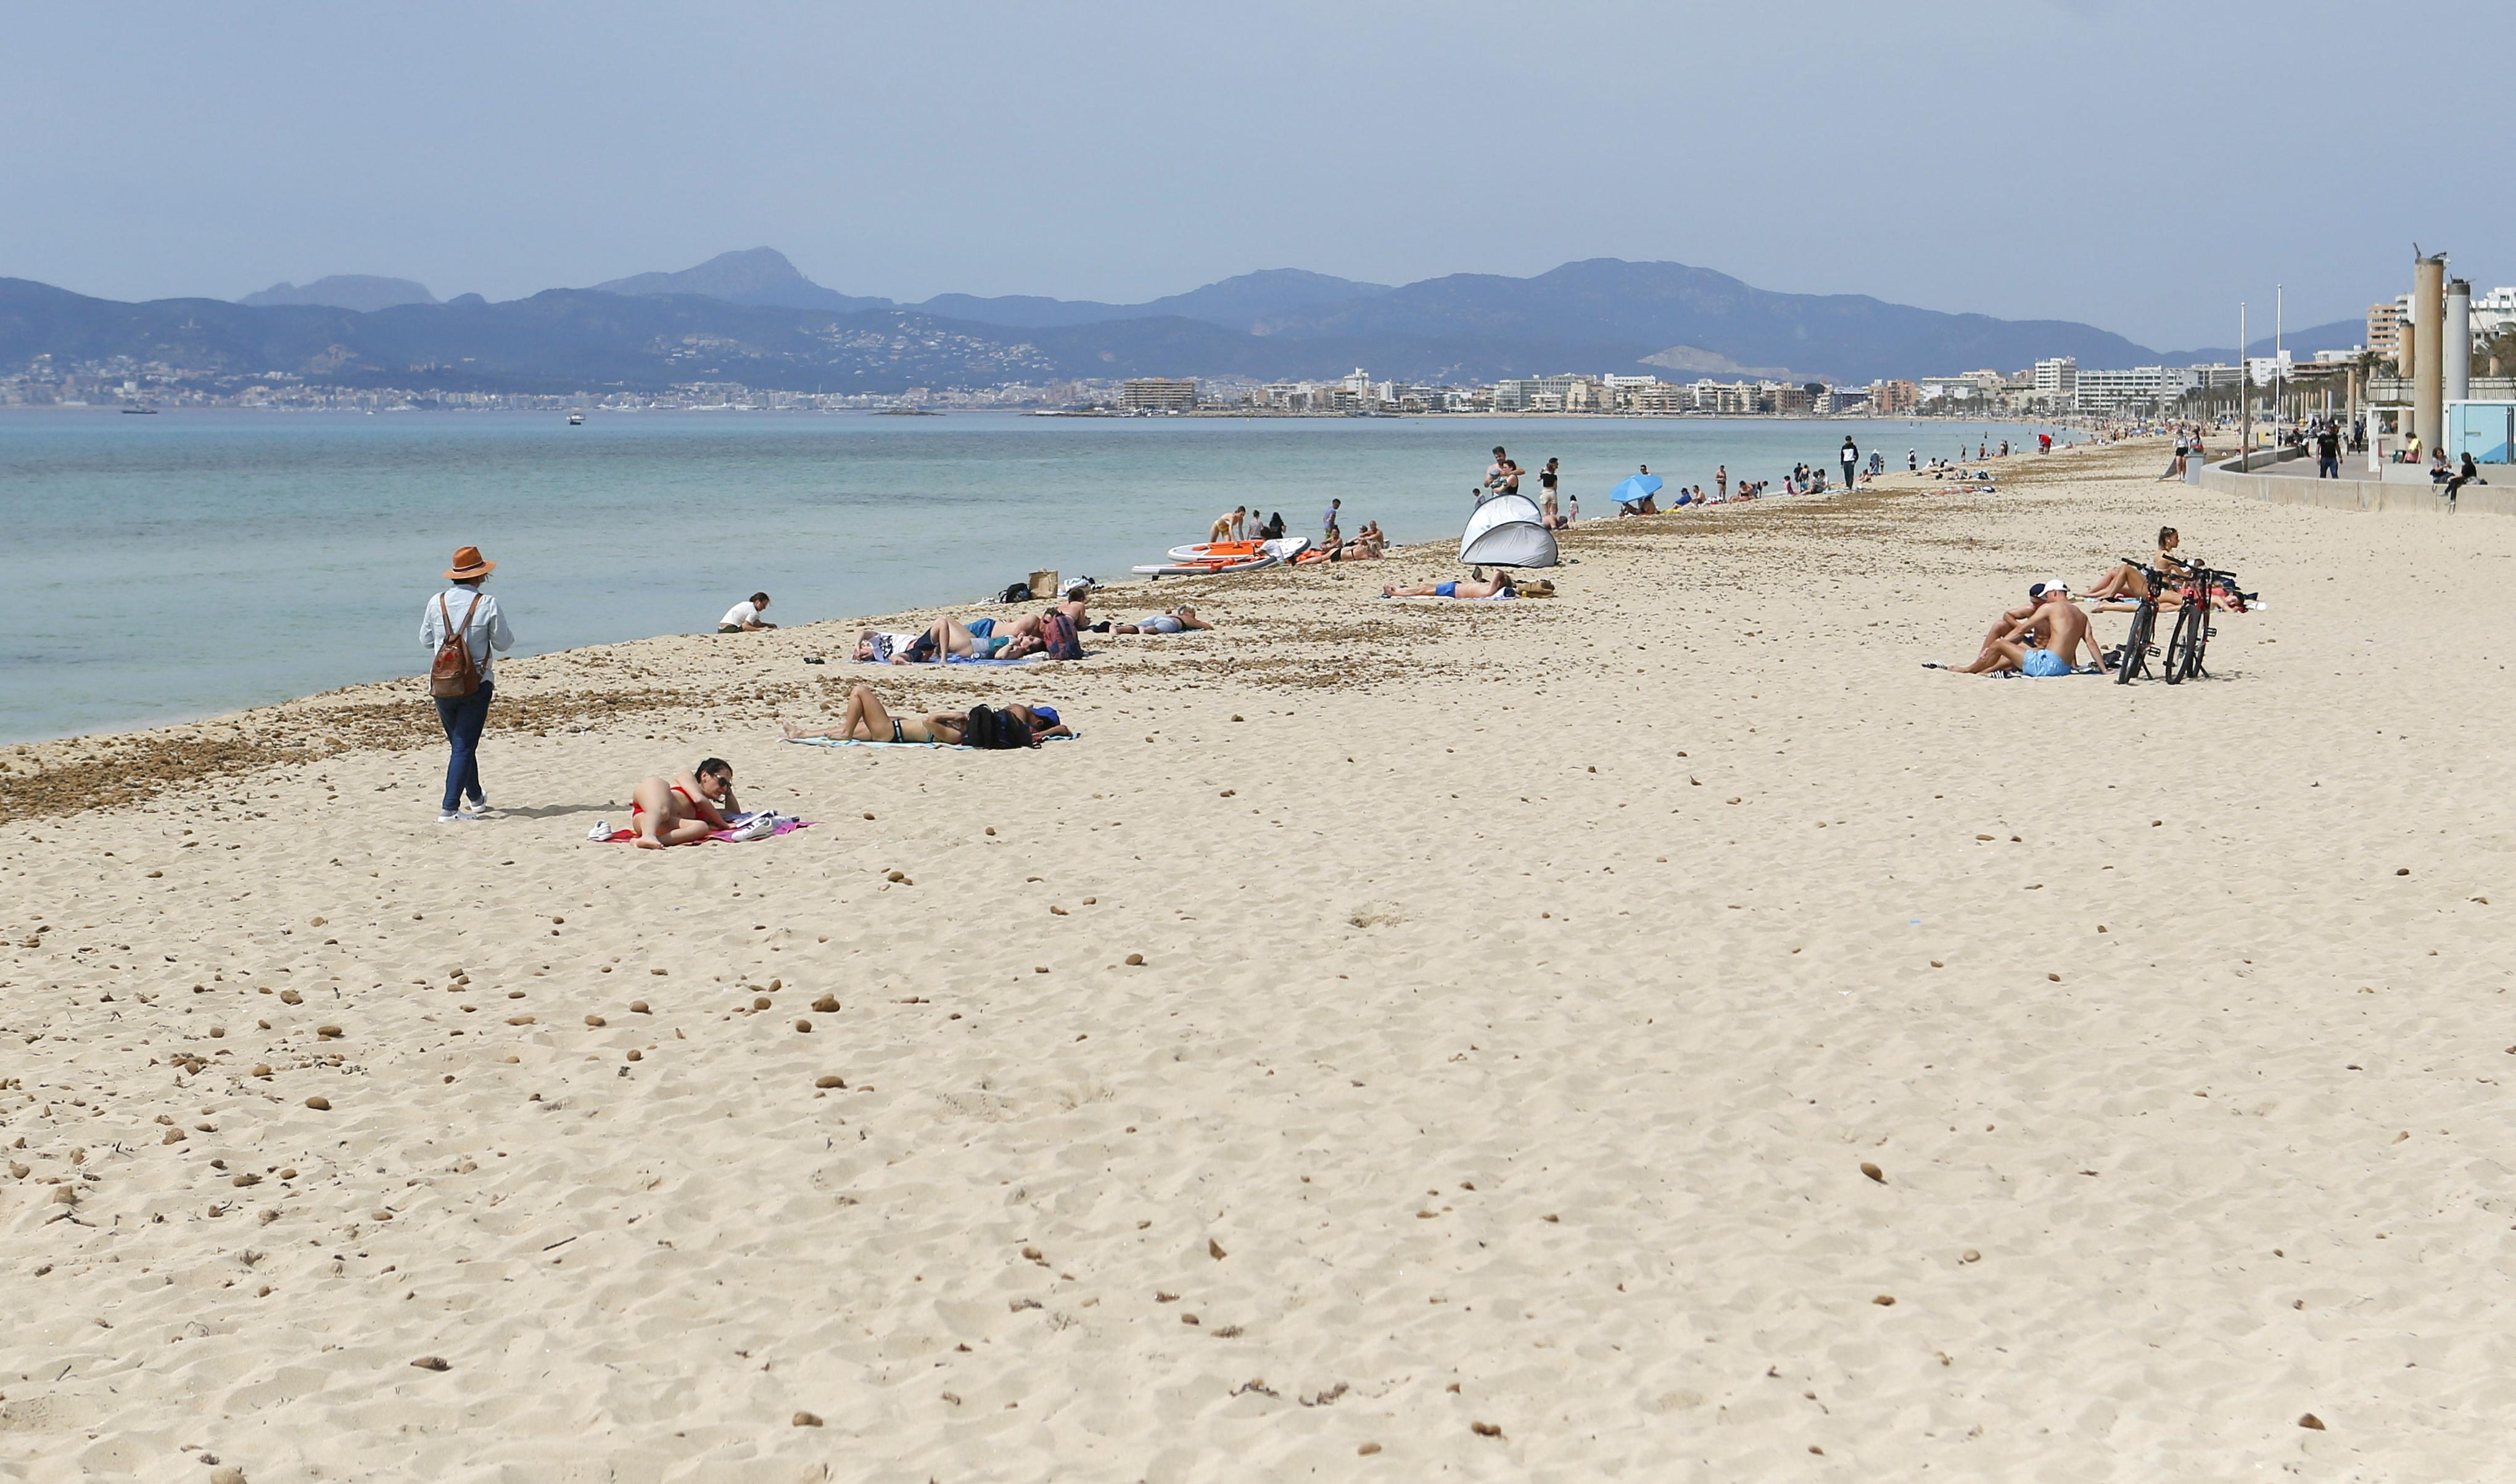 People sunbathe and chill on Playa de Palma beach in Palma de Mallorca, Spain, April 1, 2021. REUTERS/Enrique Calvo